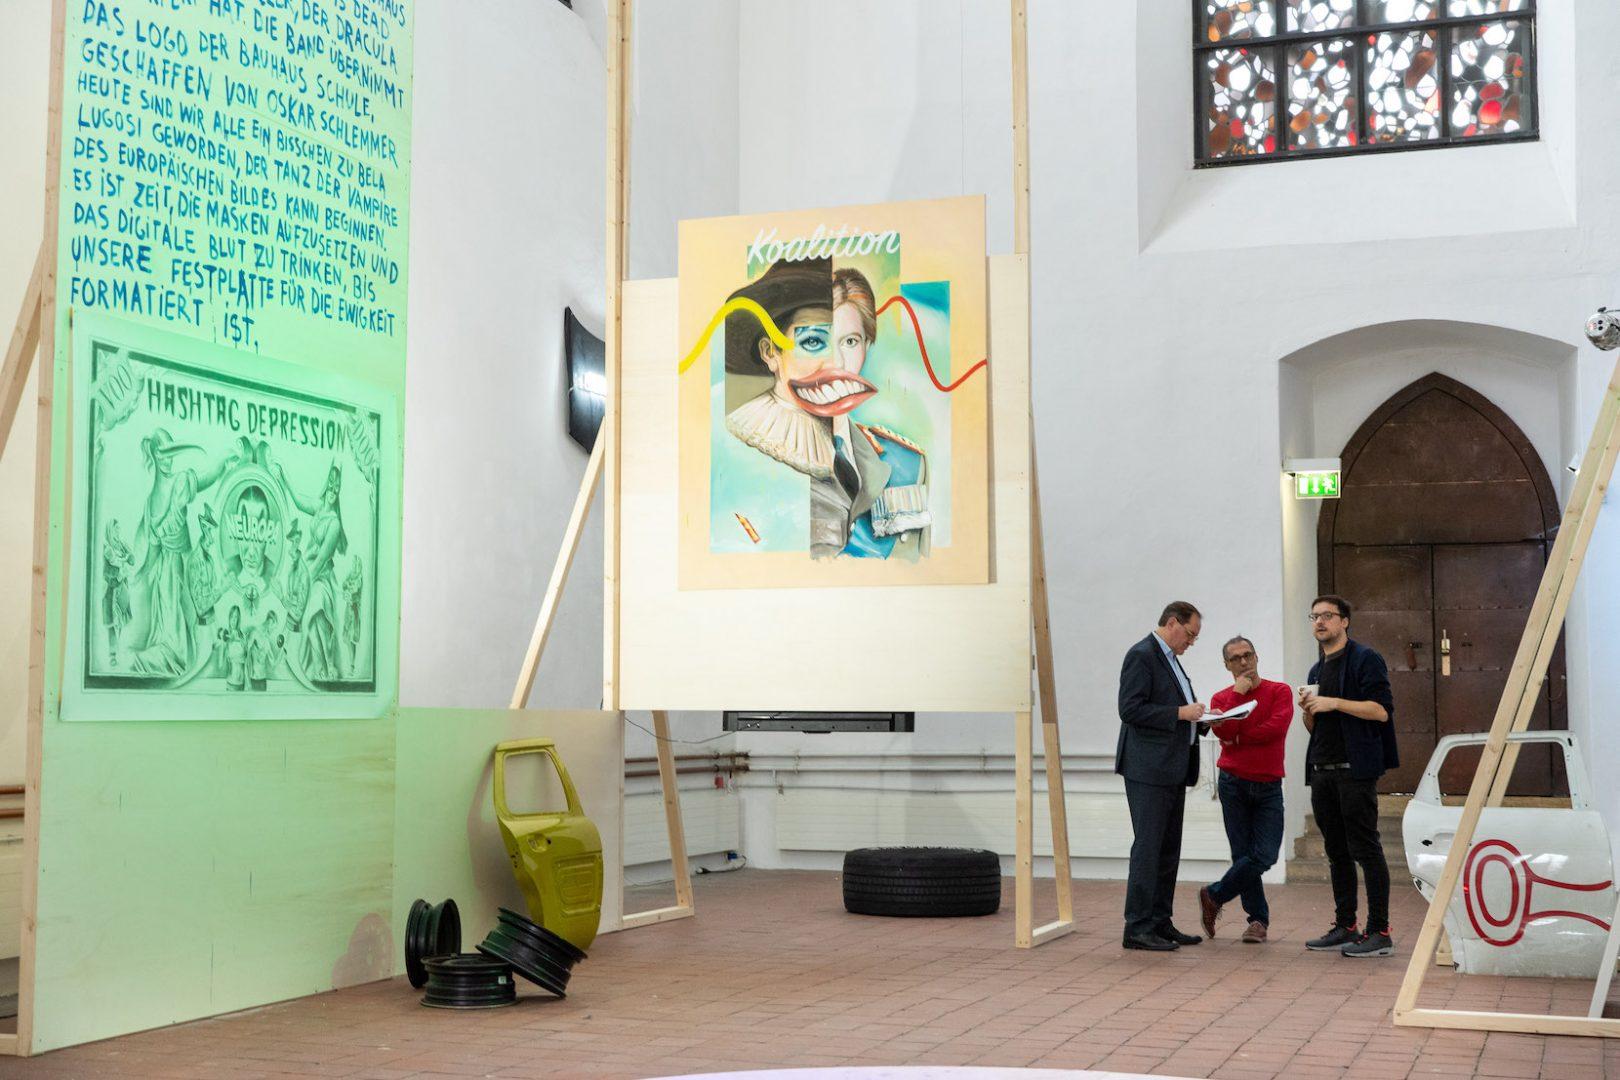 Filip Markiewicz | Celebration Factory, Enrico Lunghi und Filip Markiewicz im Pressegespräch, Kunsthalle Osnabrück, 2019/20. Courtesy Friso Gentsch / Kunsthalle Osnabrück